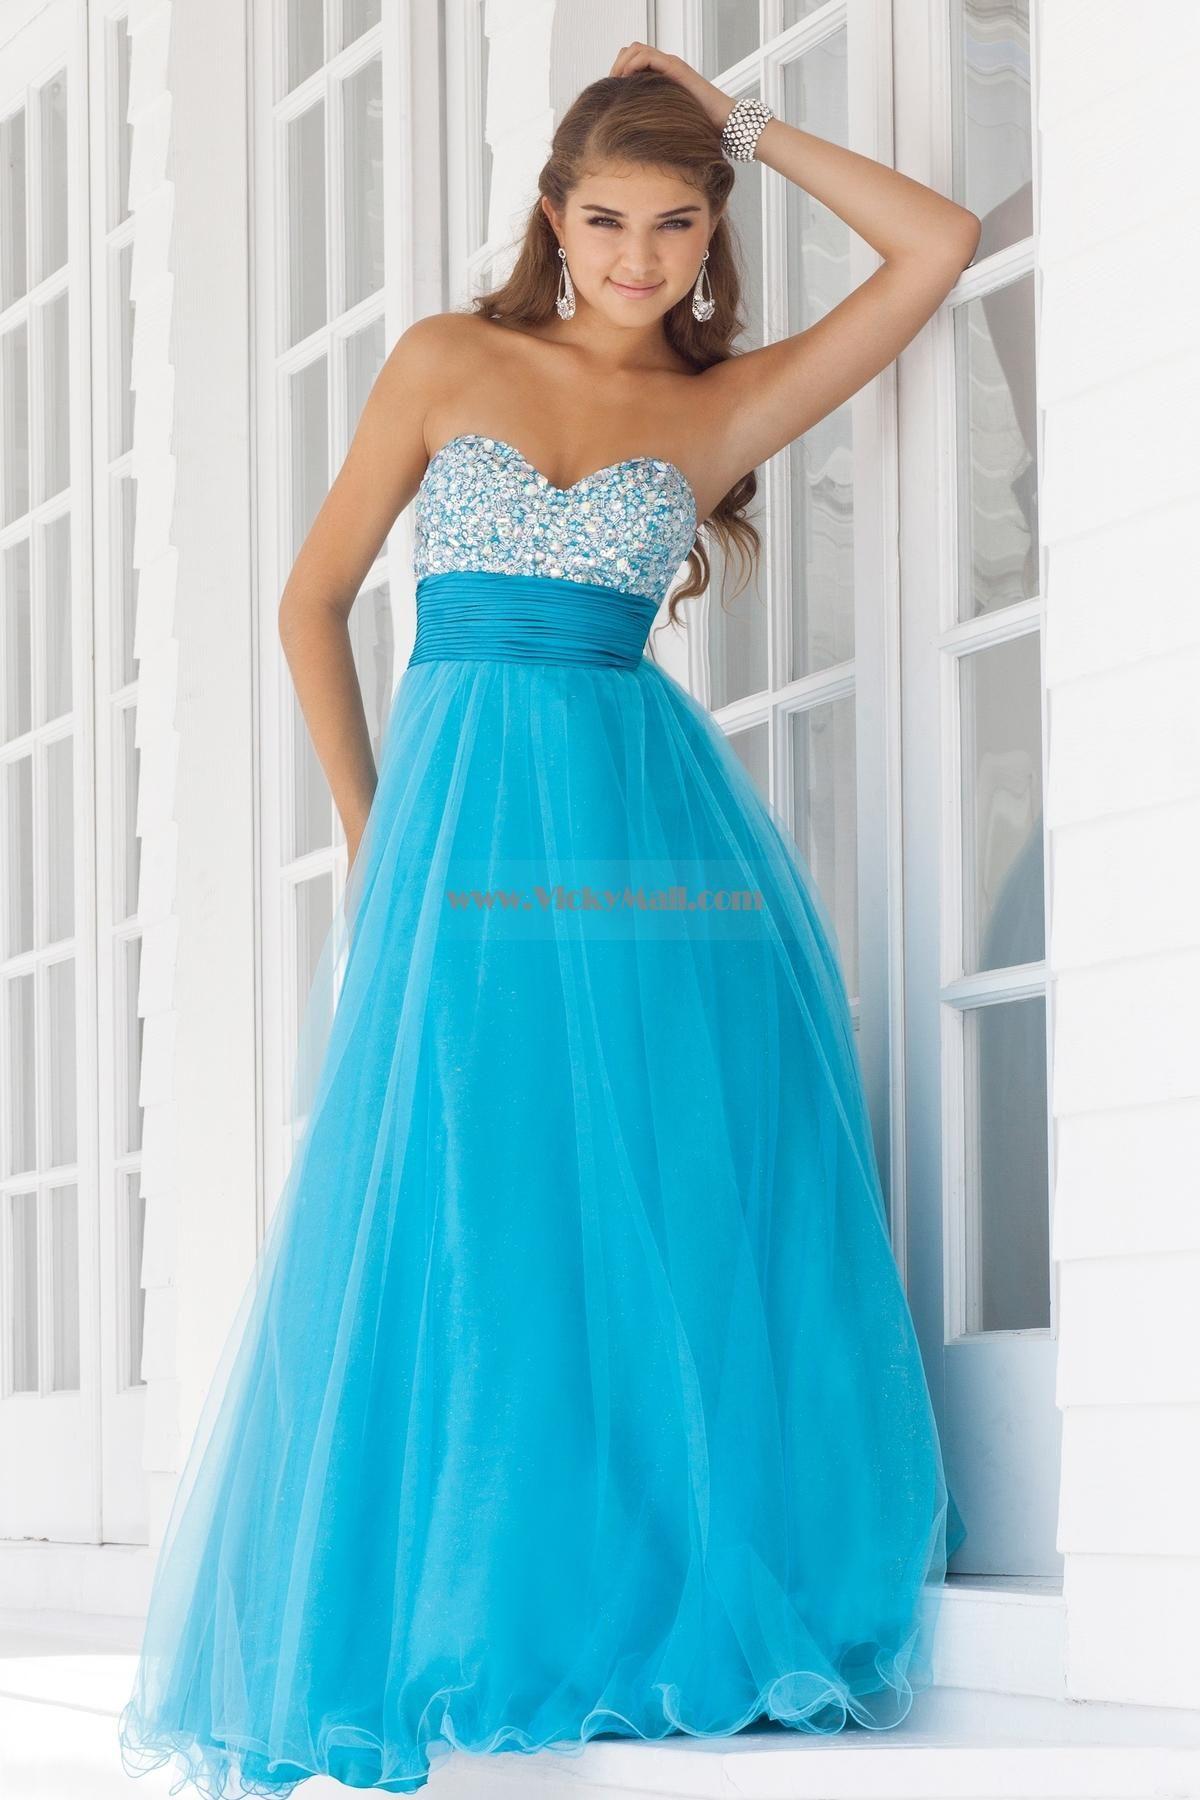 Summer dresses simple pinterest summer dresses blue summer